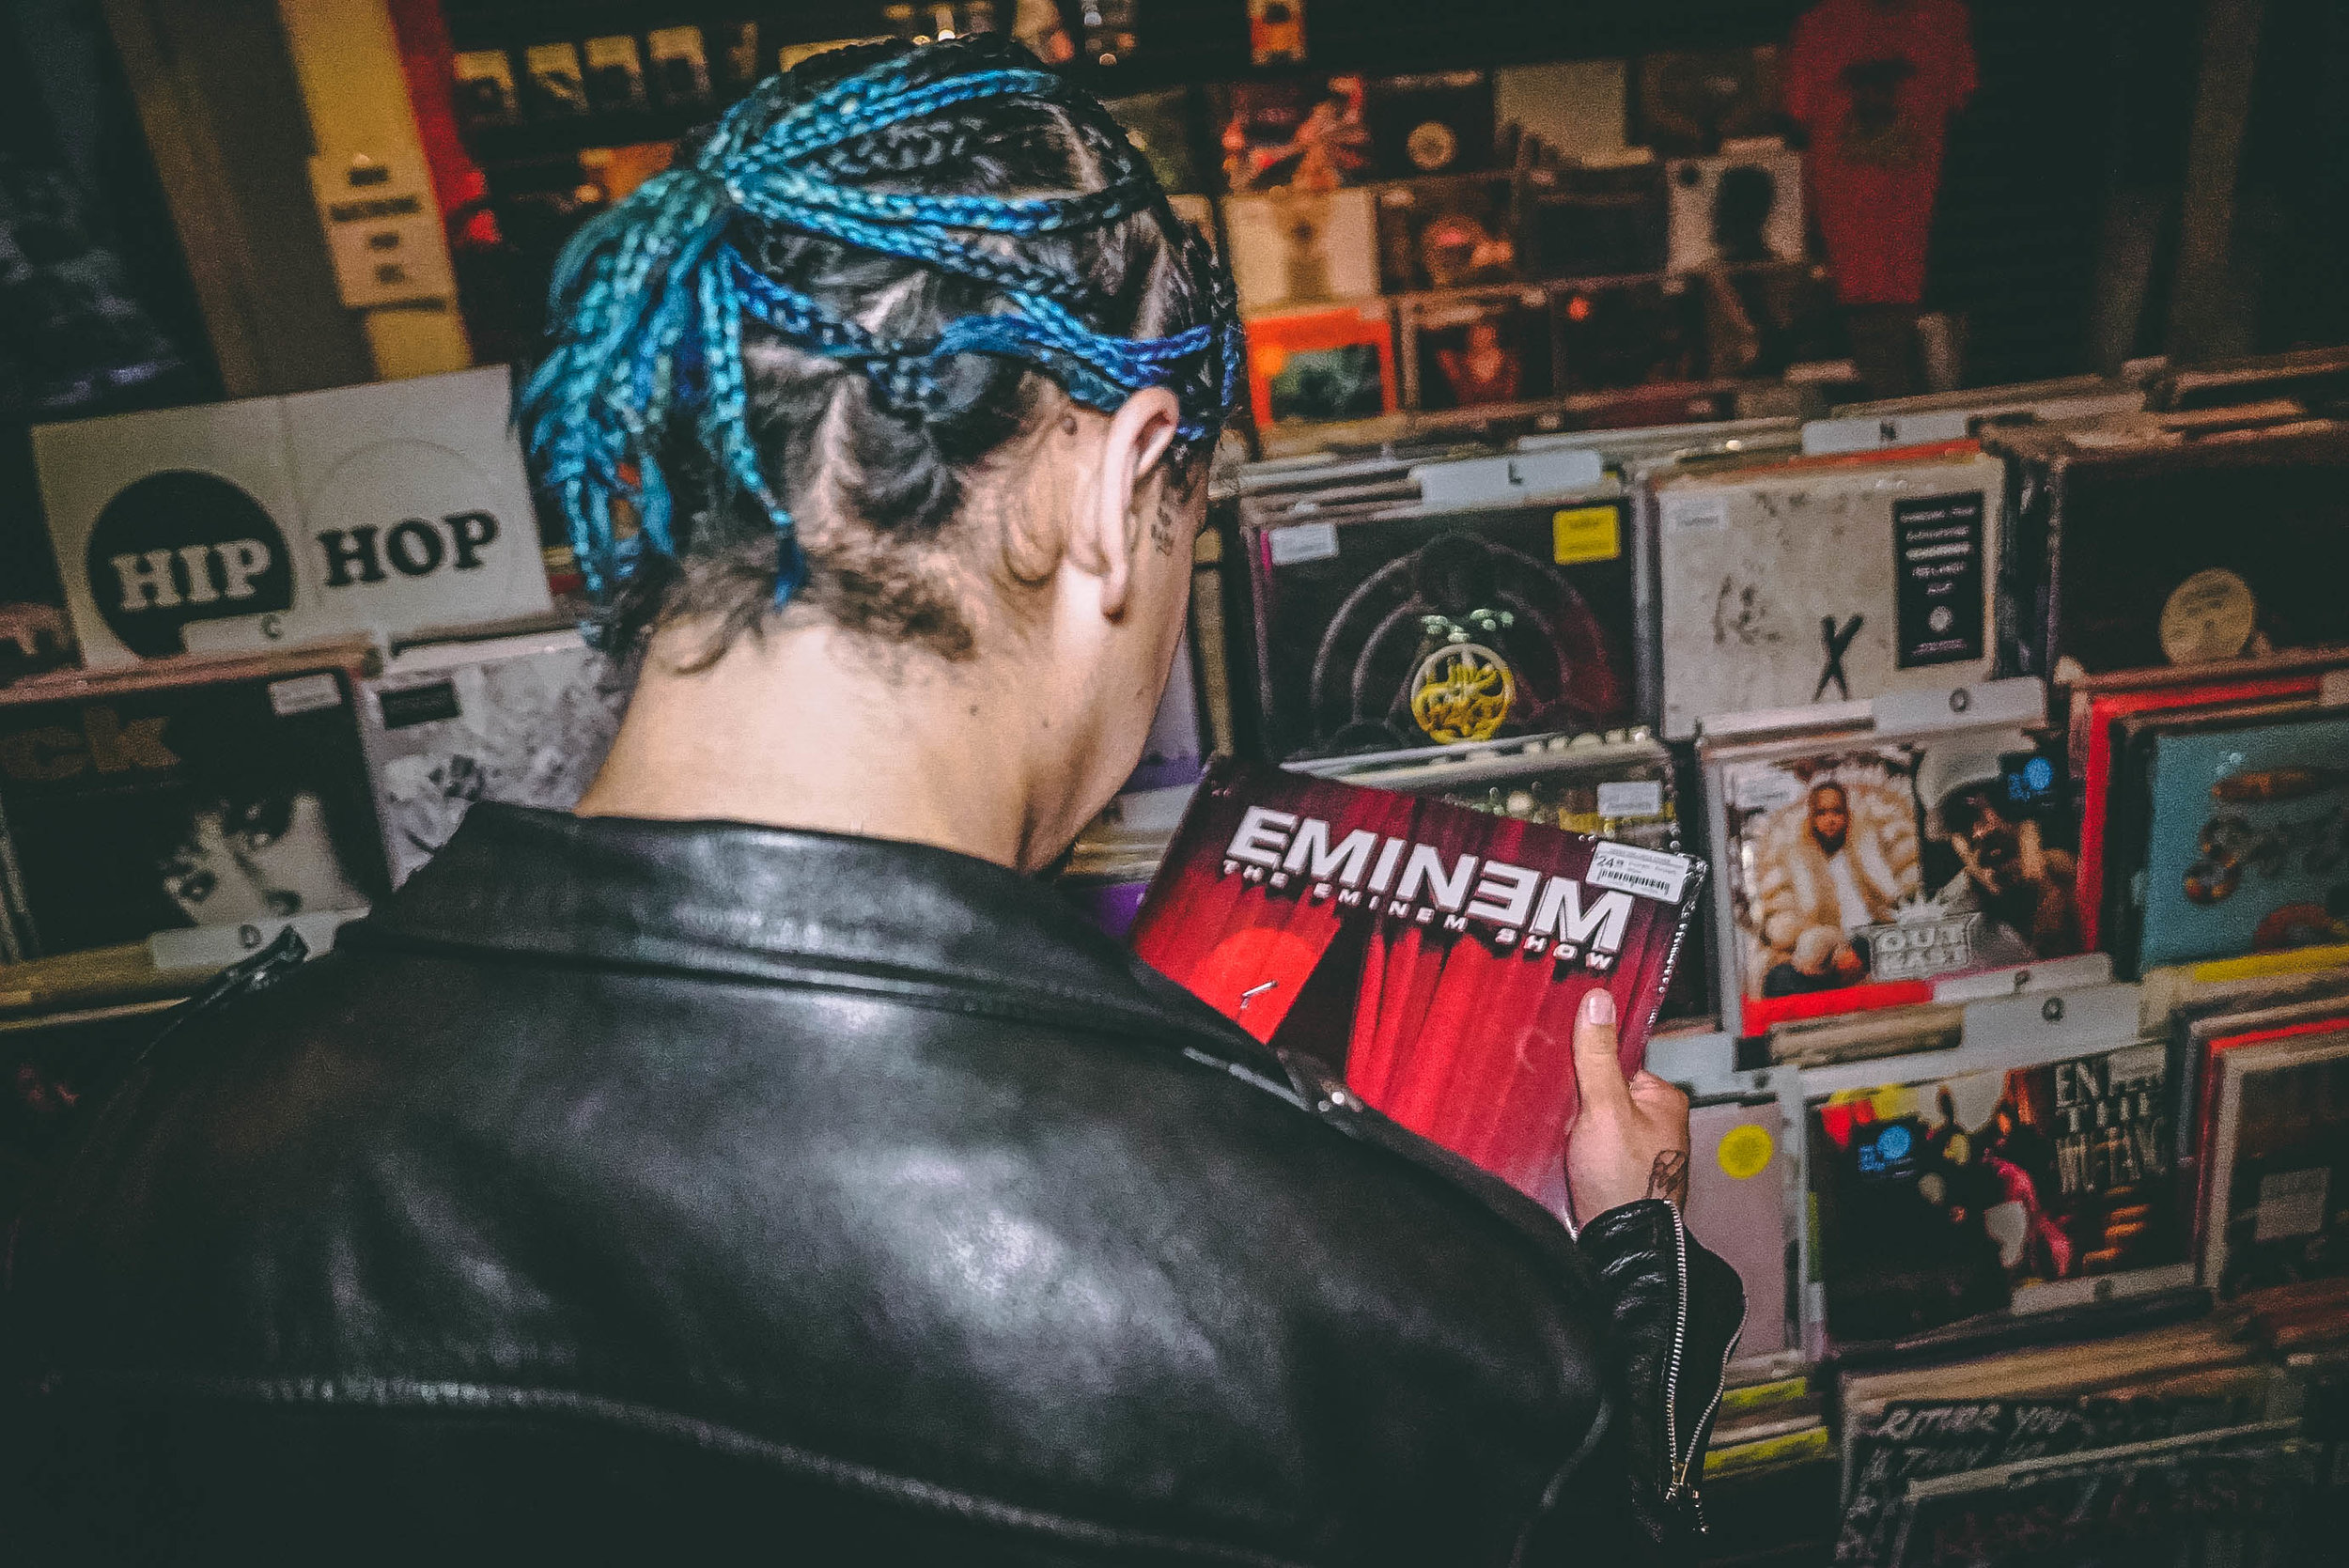 Eminem Vinyl 9-14-17.jpg